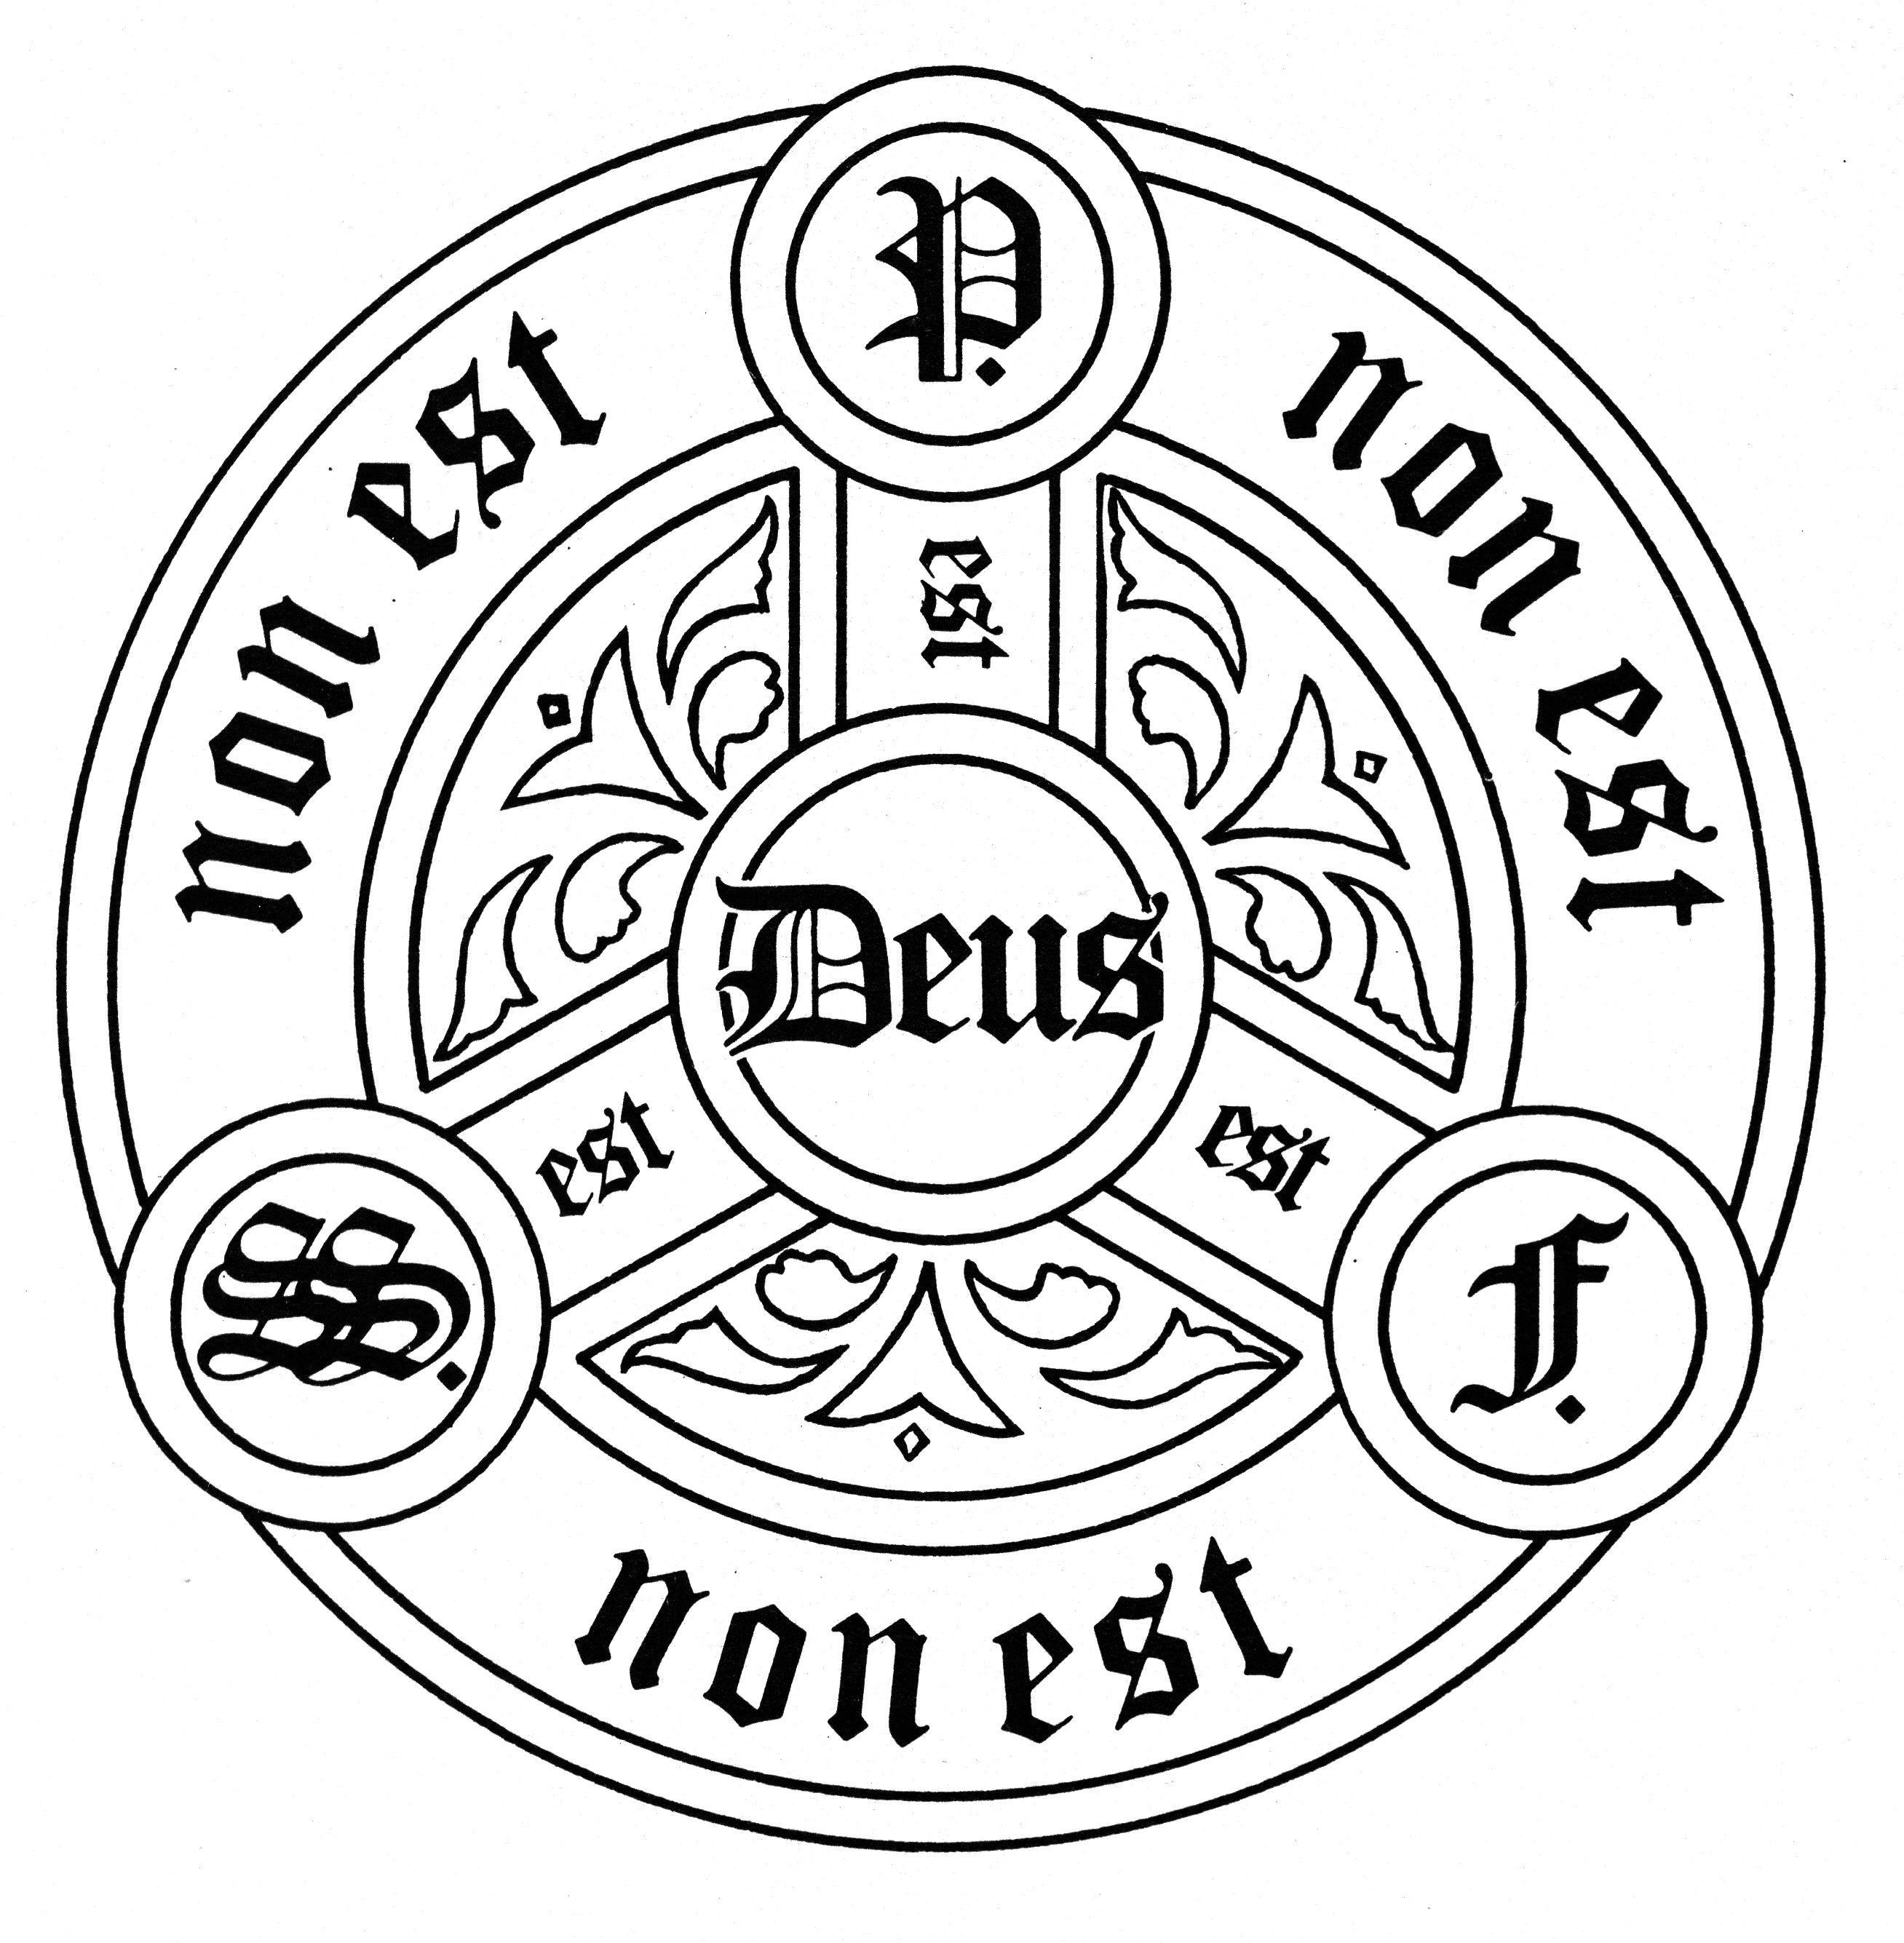 God Is Omni Potent Present Scient Benevolent Catholicism